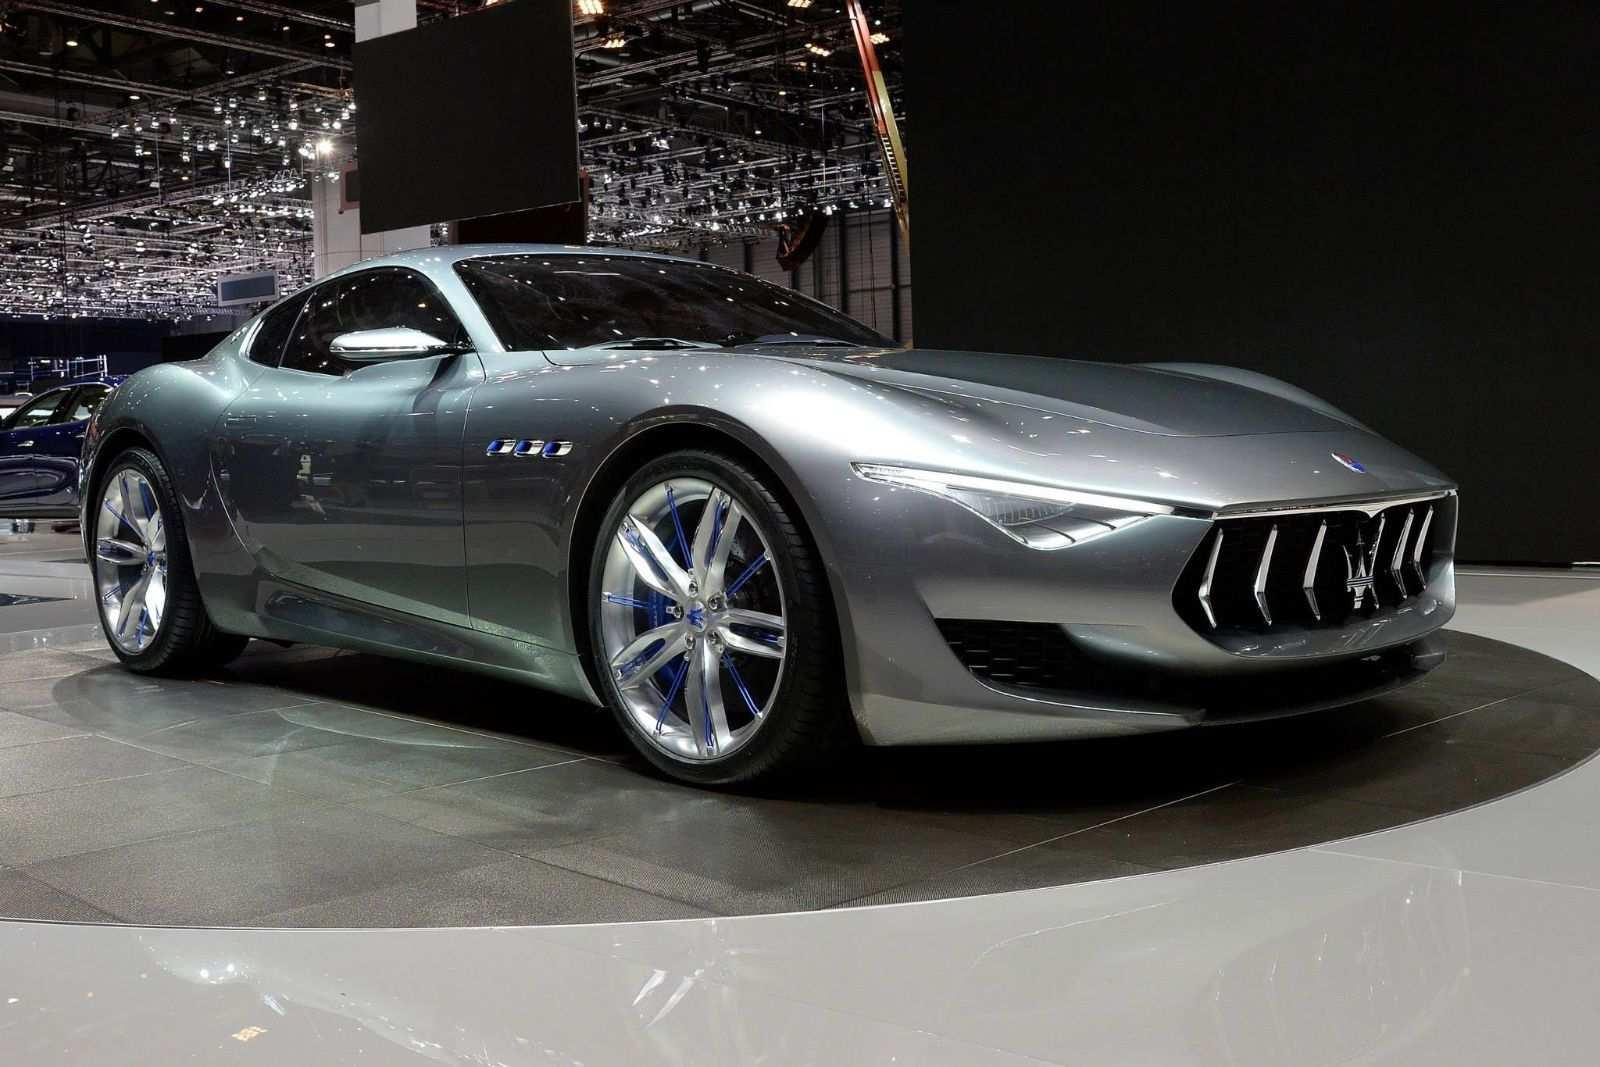 44 Best Review New Maserati 2020 Speed Test with New Maserati 2020